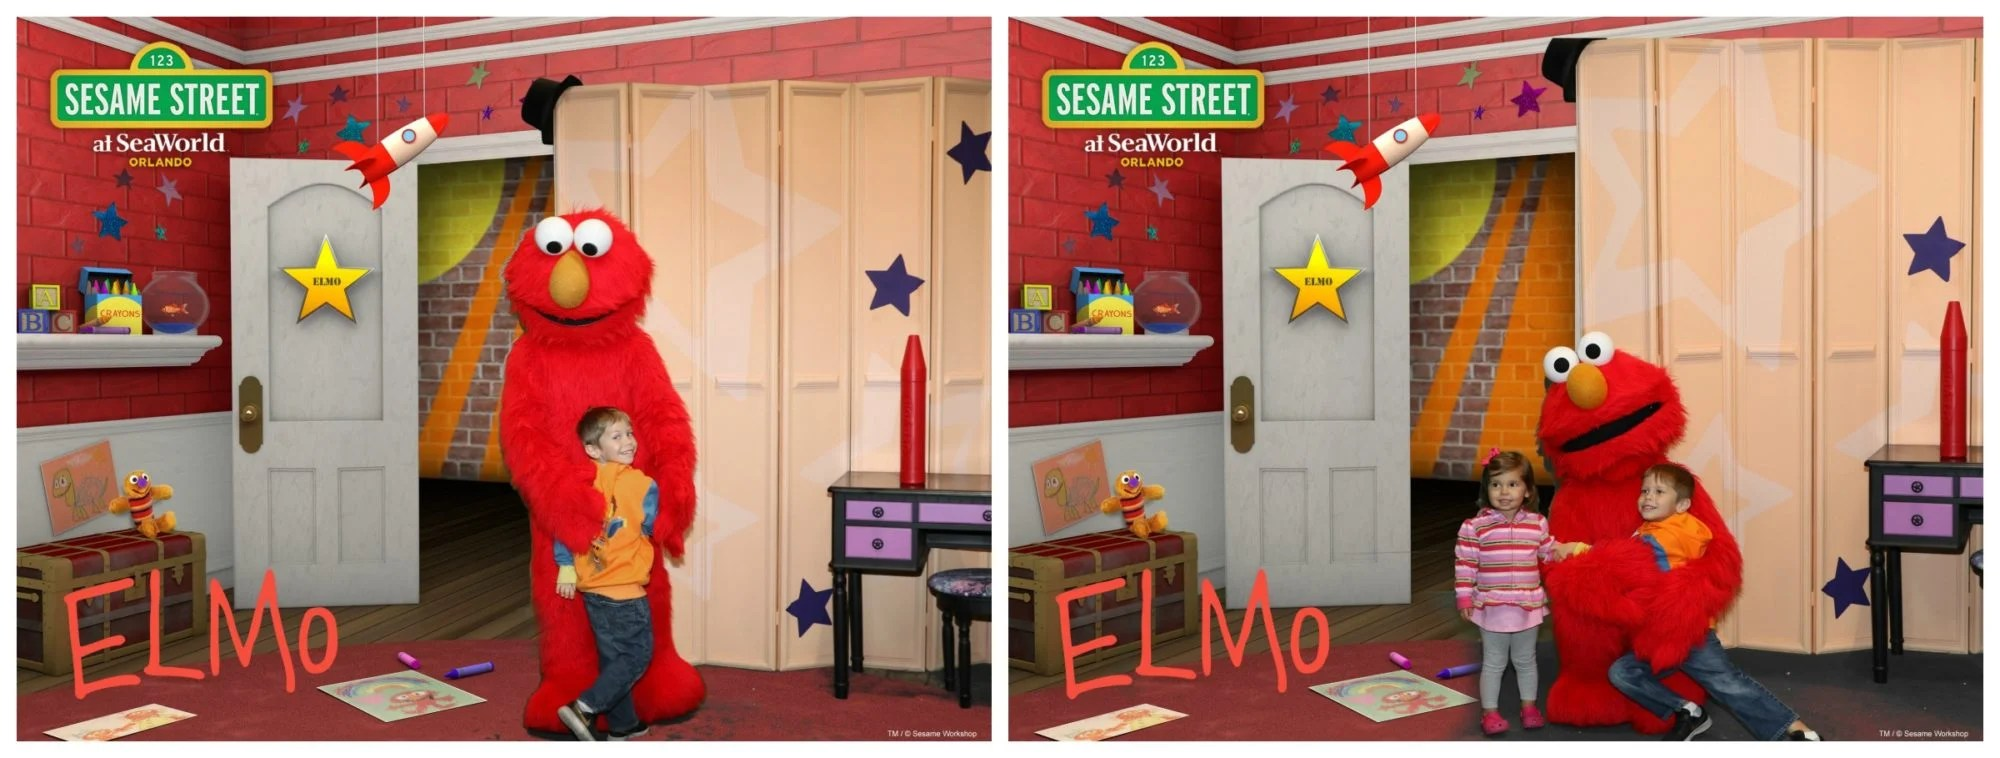 SESAME STREET AT SEAWORLD ORLANDO - Elmo Photos